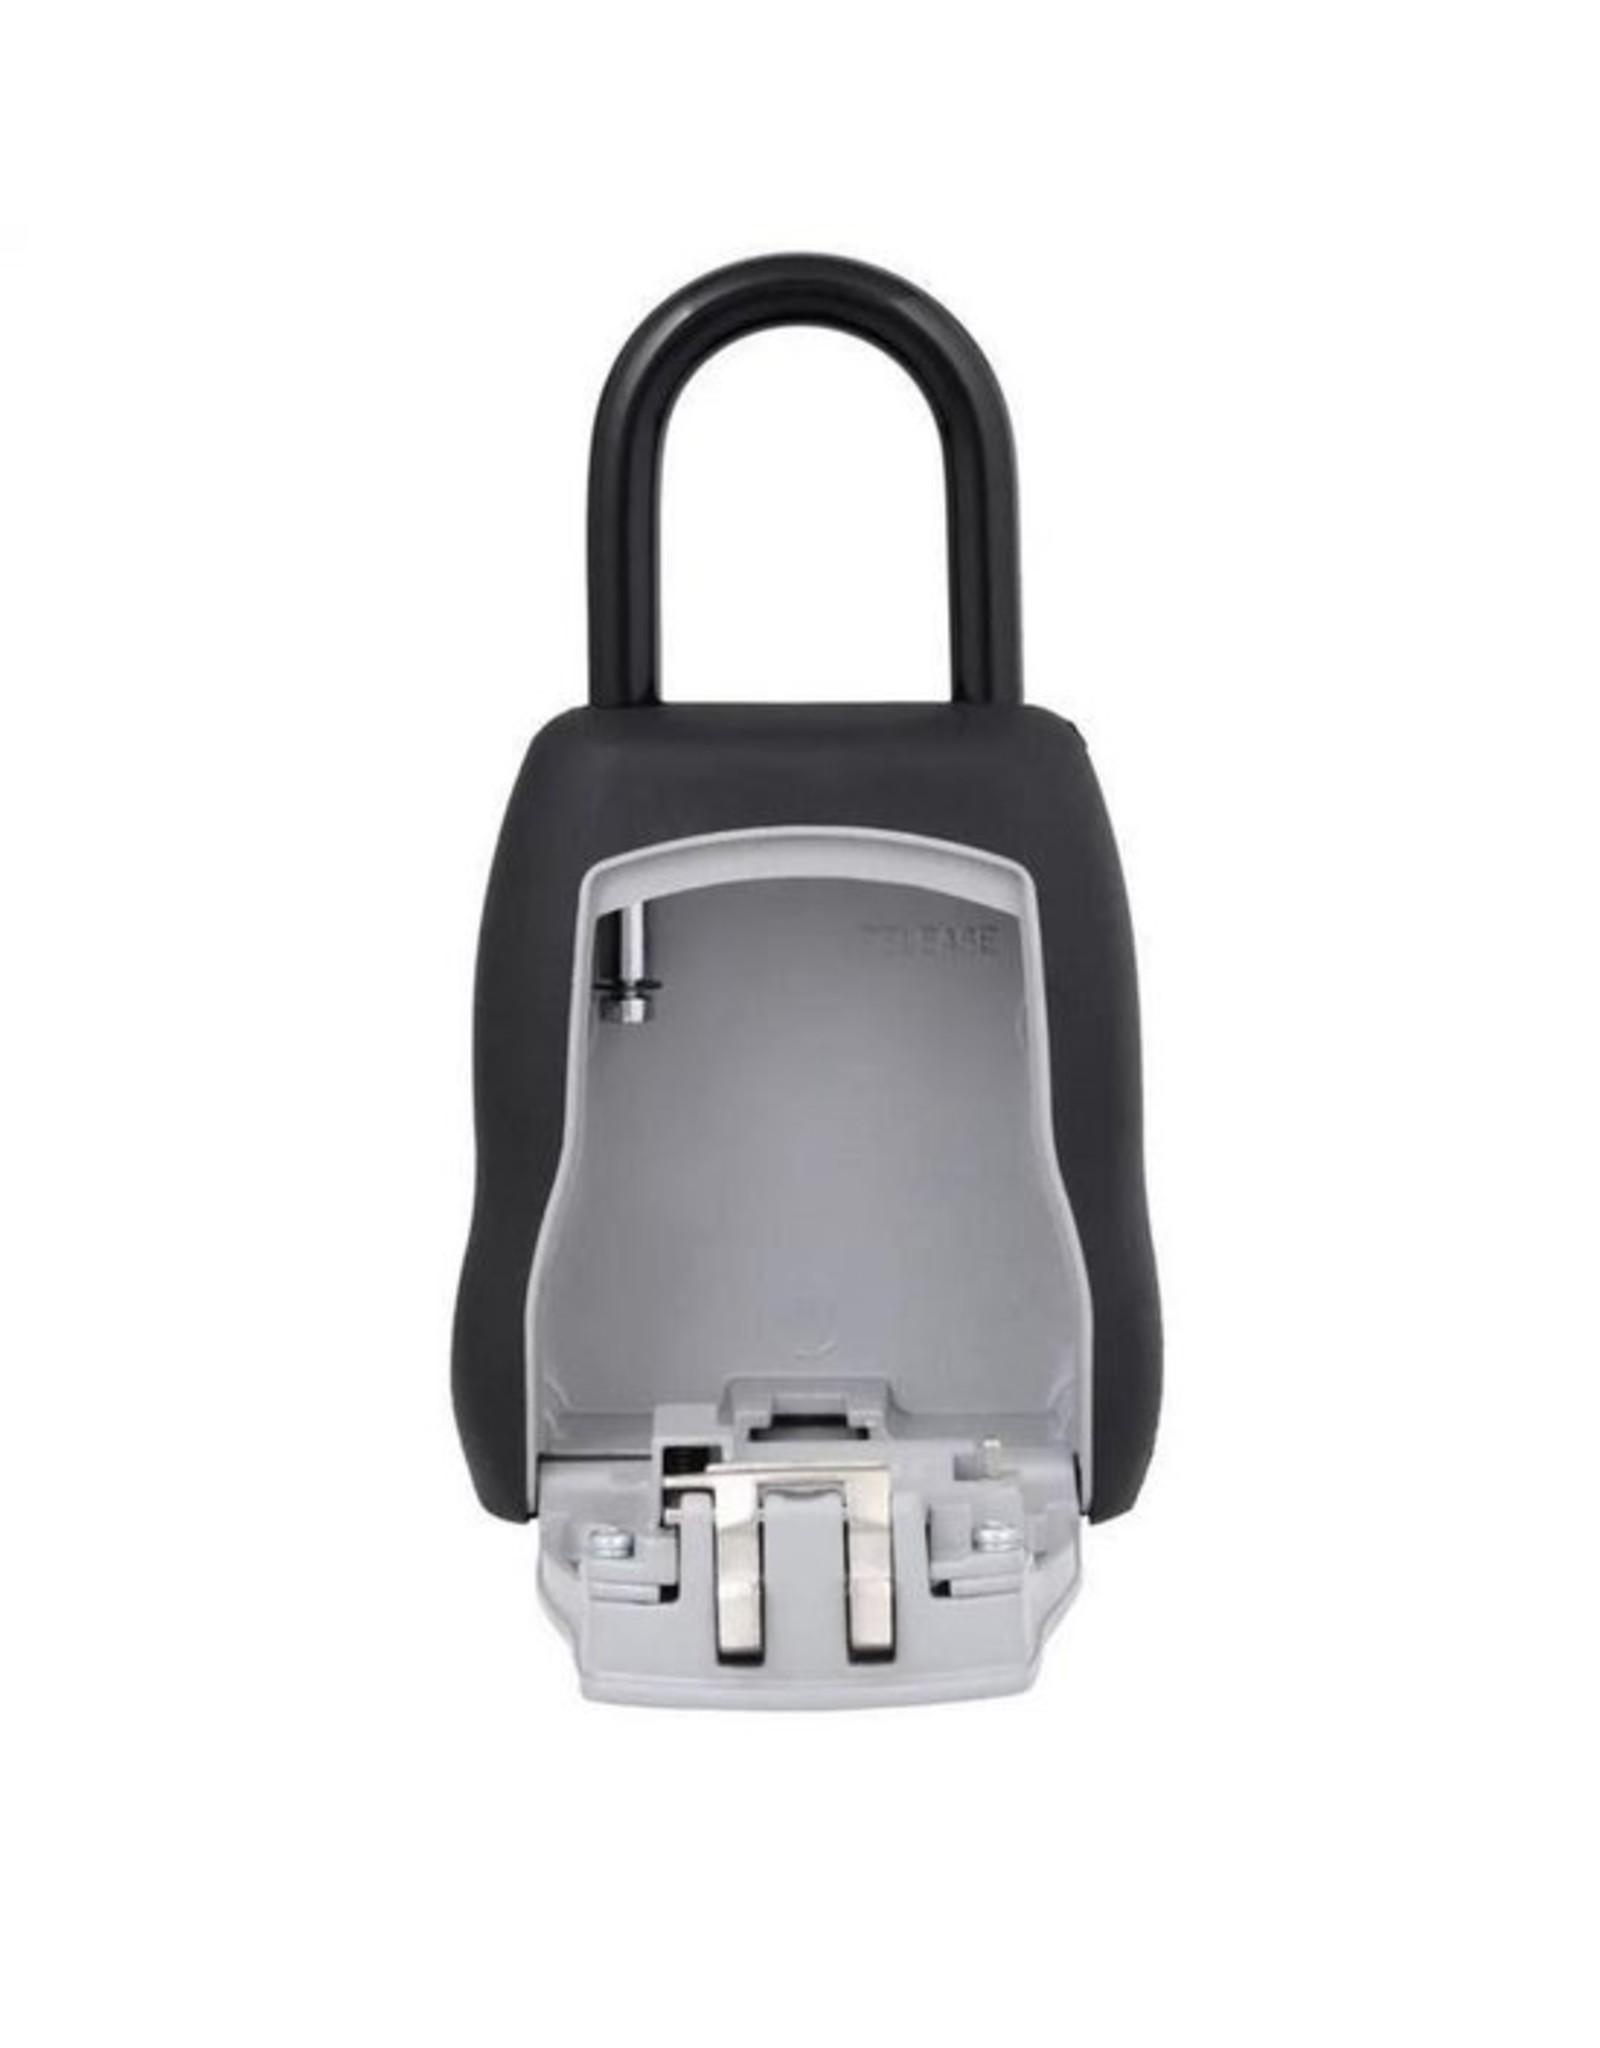 MasterLock Select Access® Sleutelkluis met beugel - 9x15,7x4 cm - 5400EURD